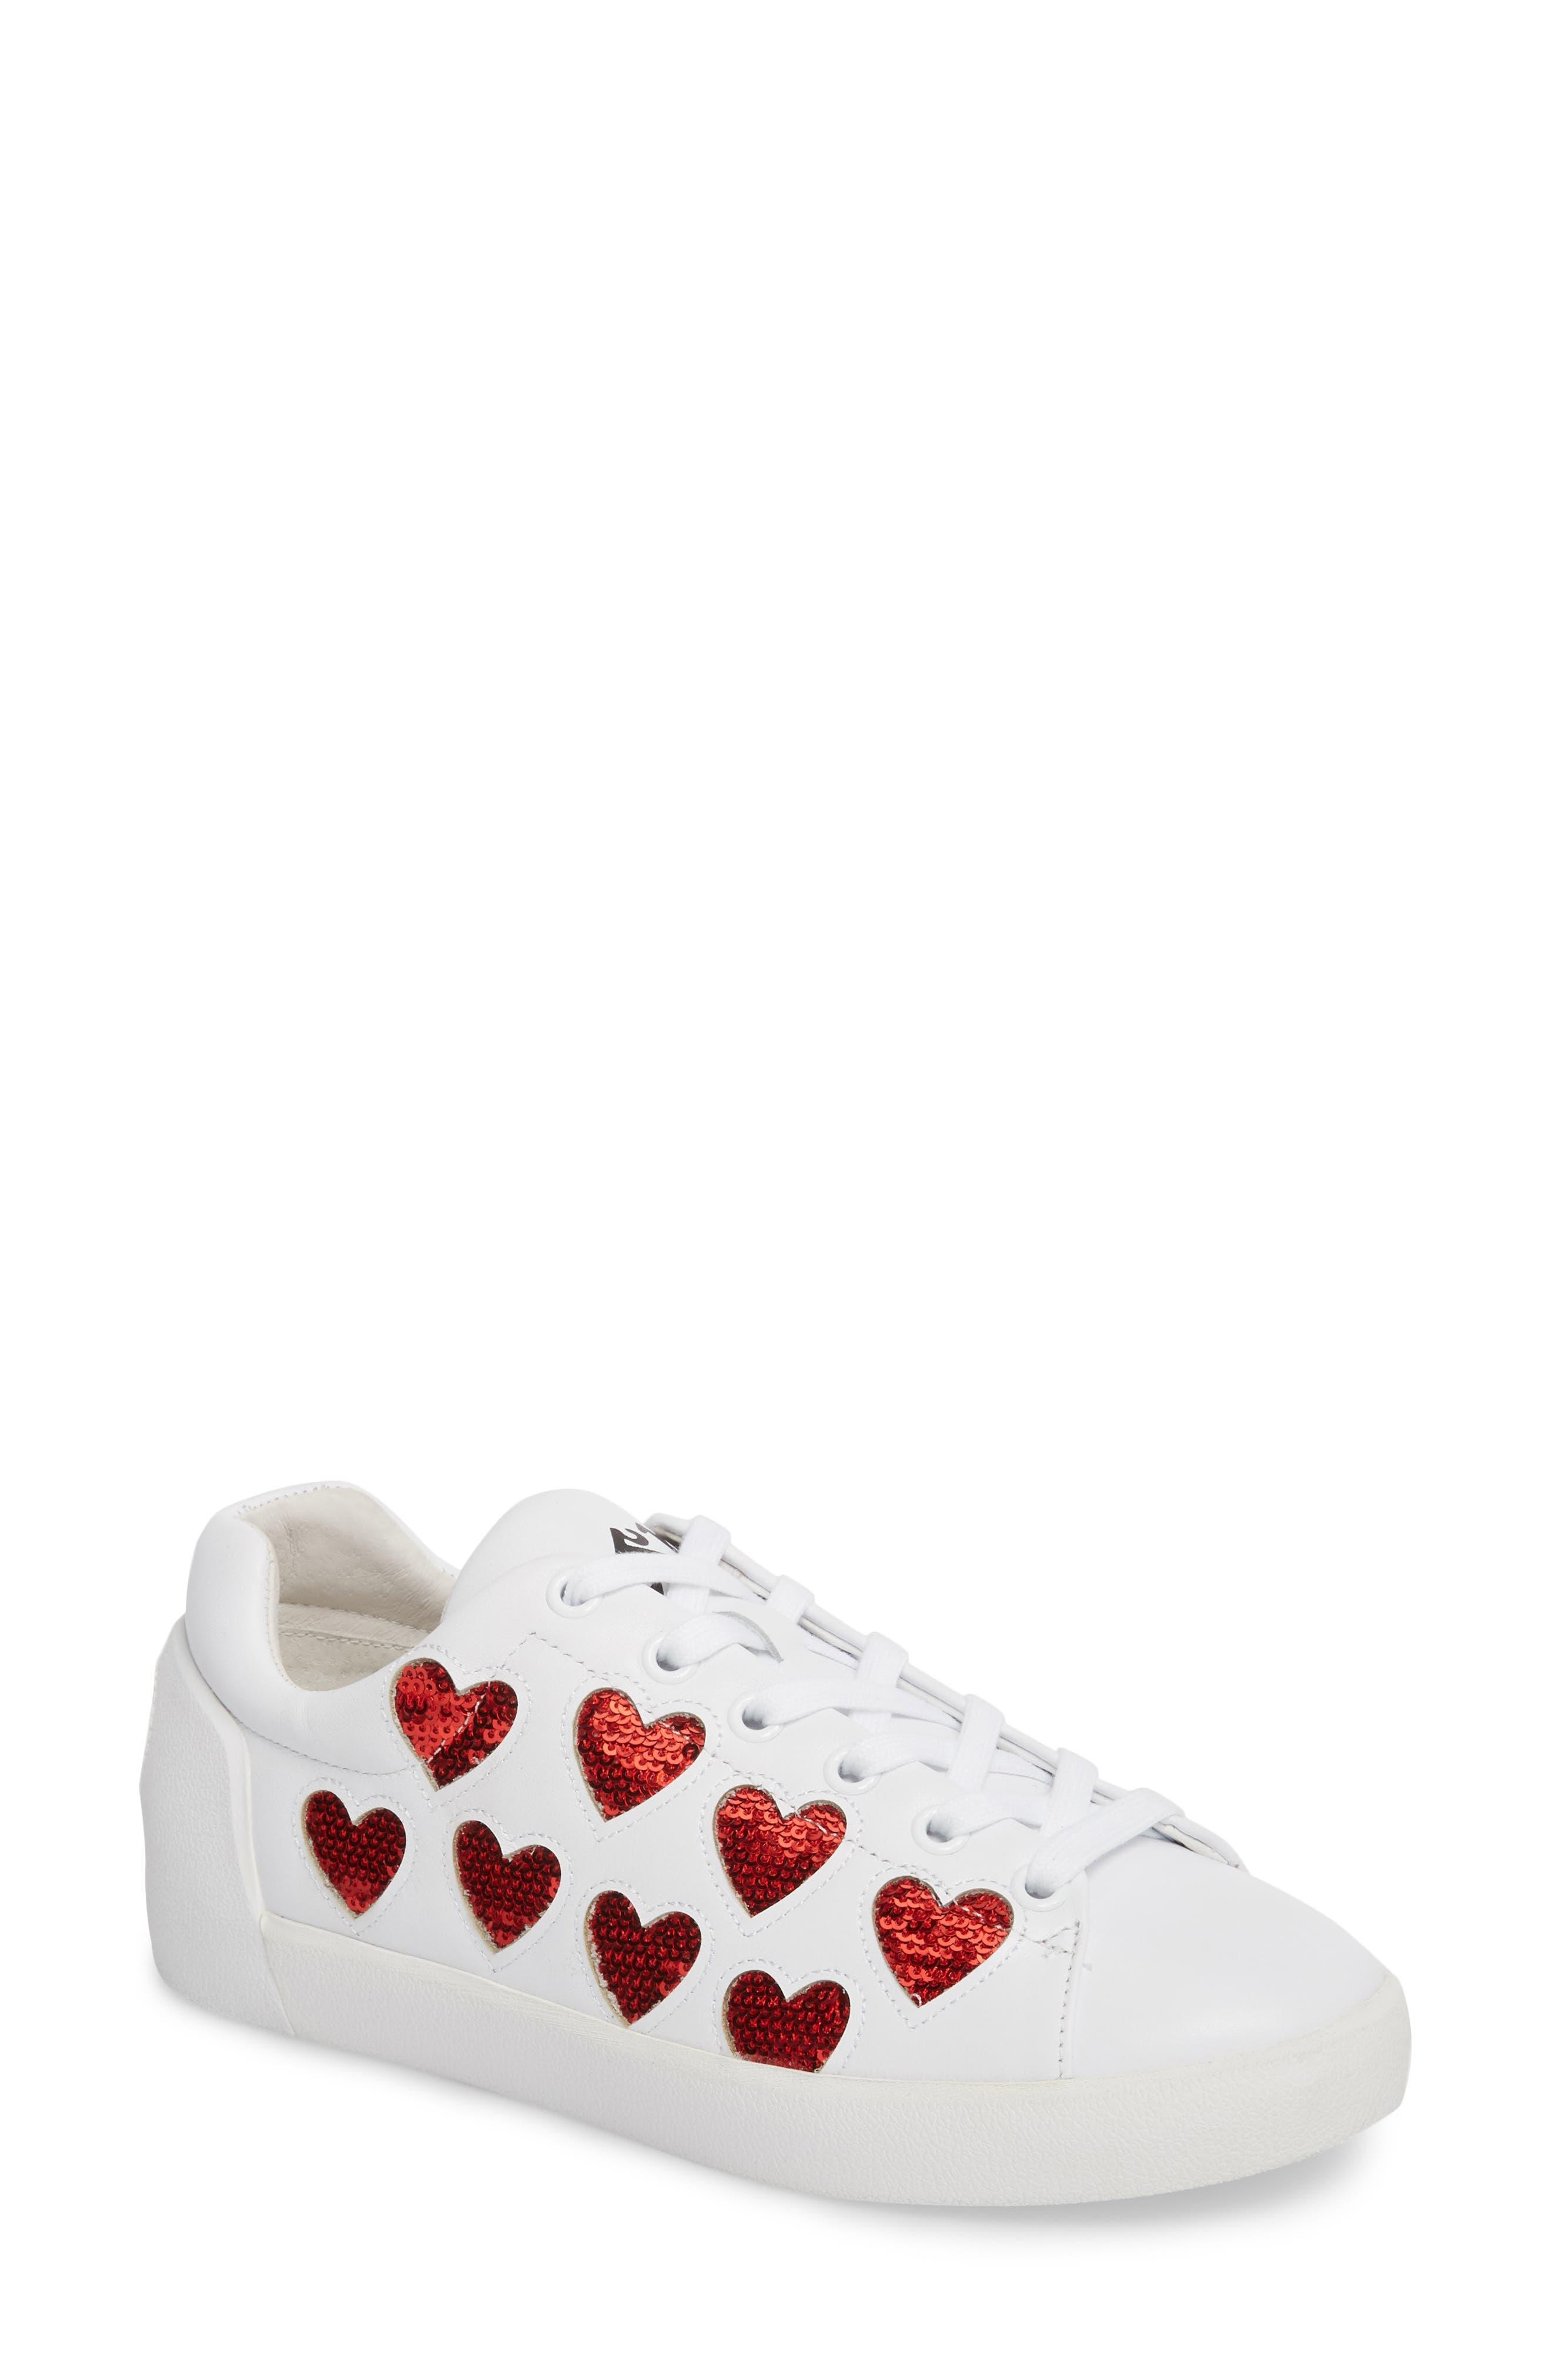 Nikita Sneaker,                             Main thumbnail 1, color,                             131